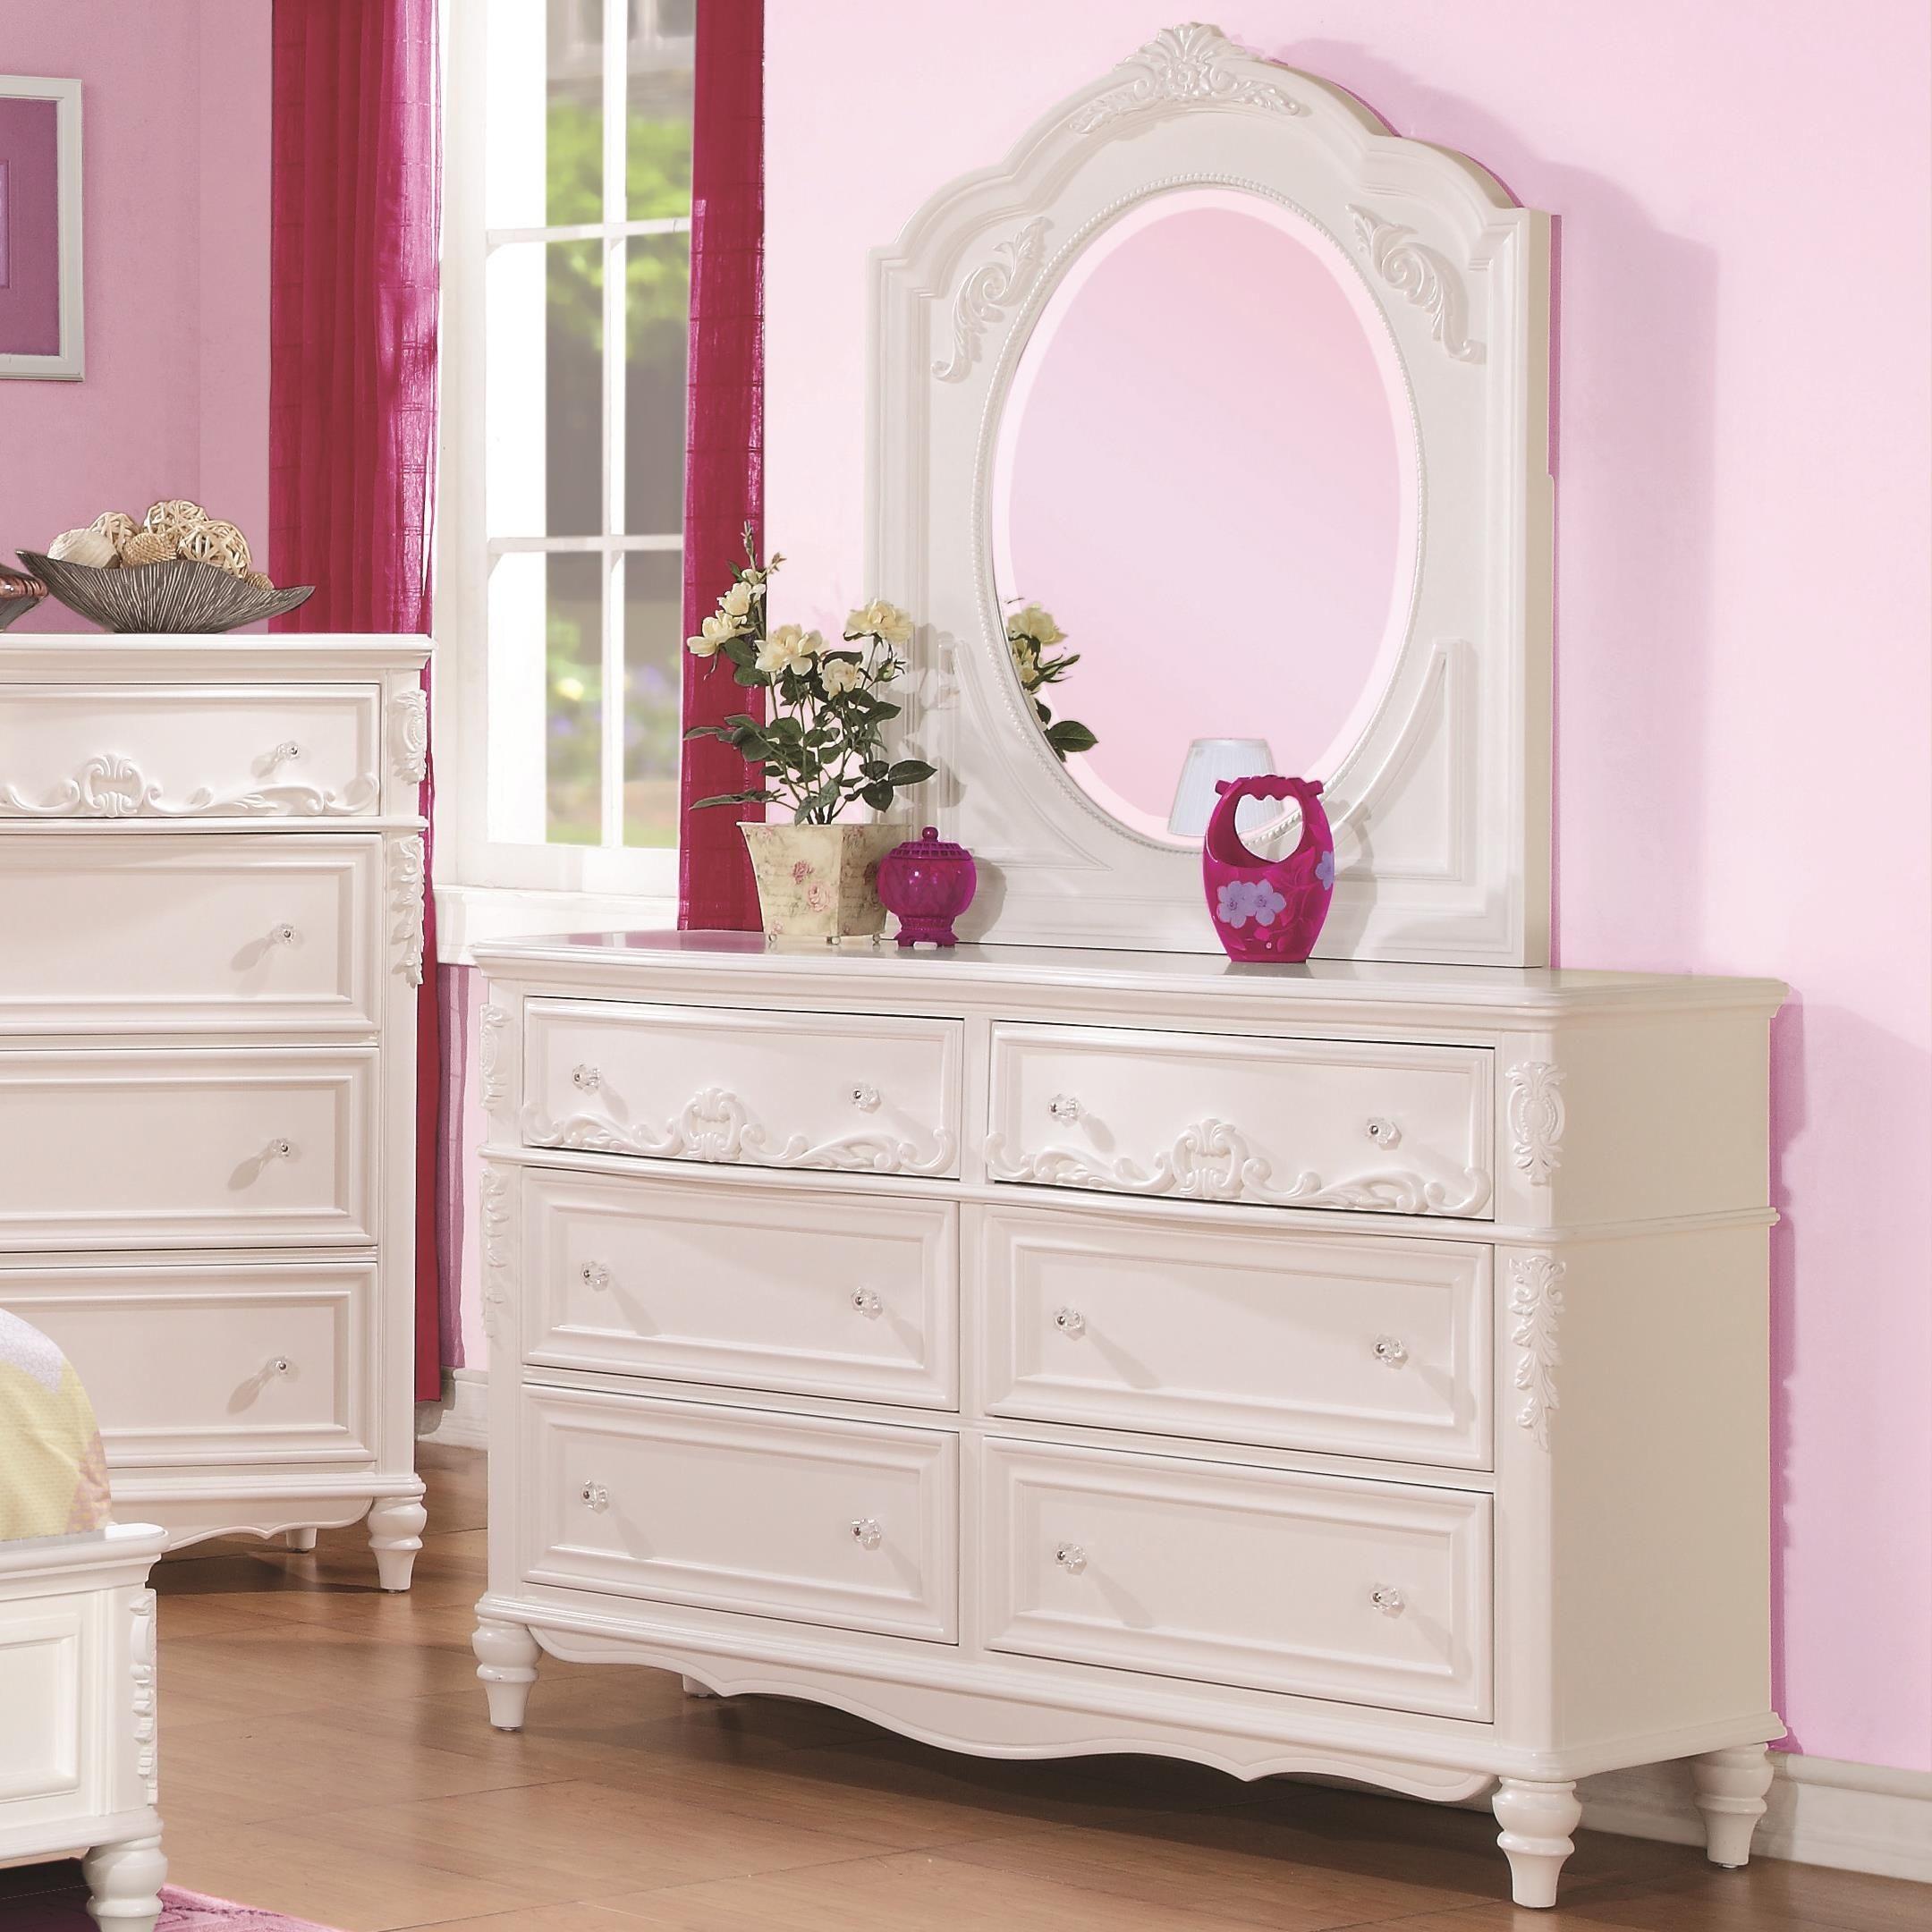 Caroline Diamond Tufted Youth Platform Bedroom Set From Coaster 400720T C